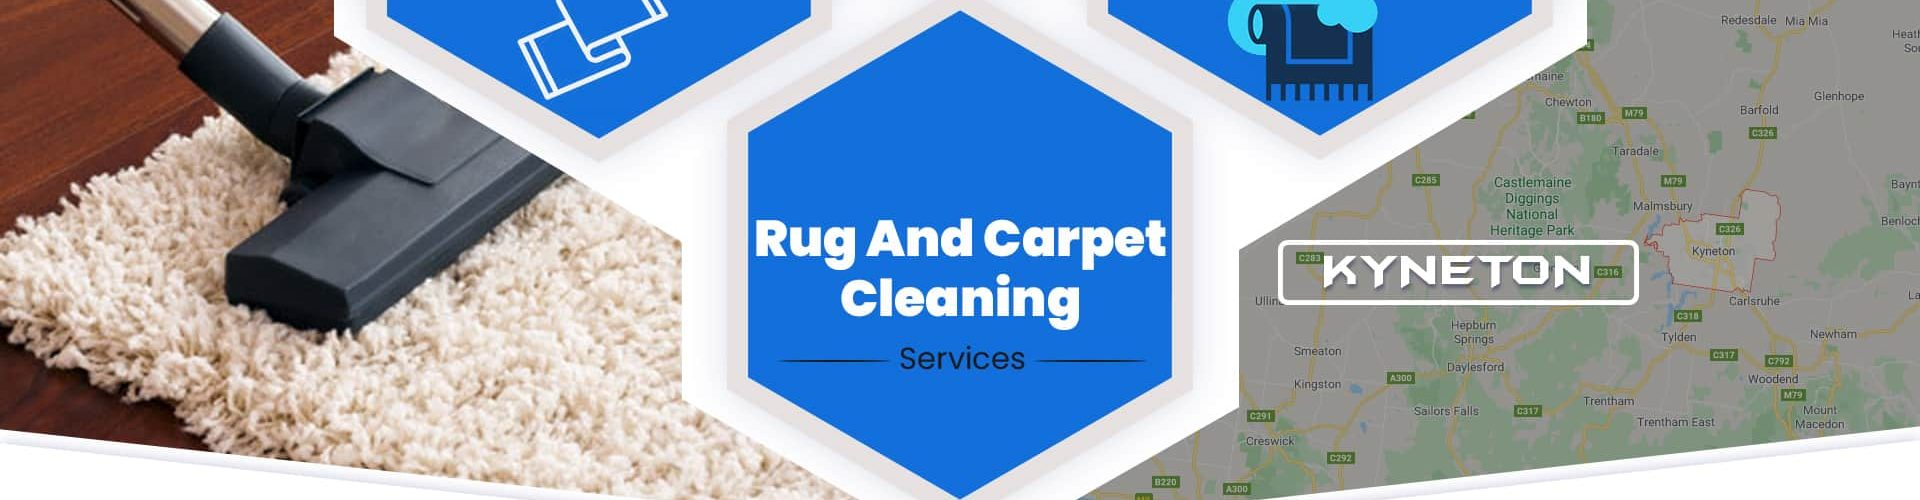 Rug and Carpet Cleaning Kyneton